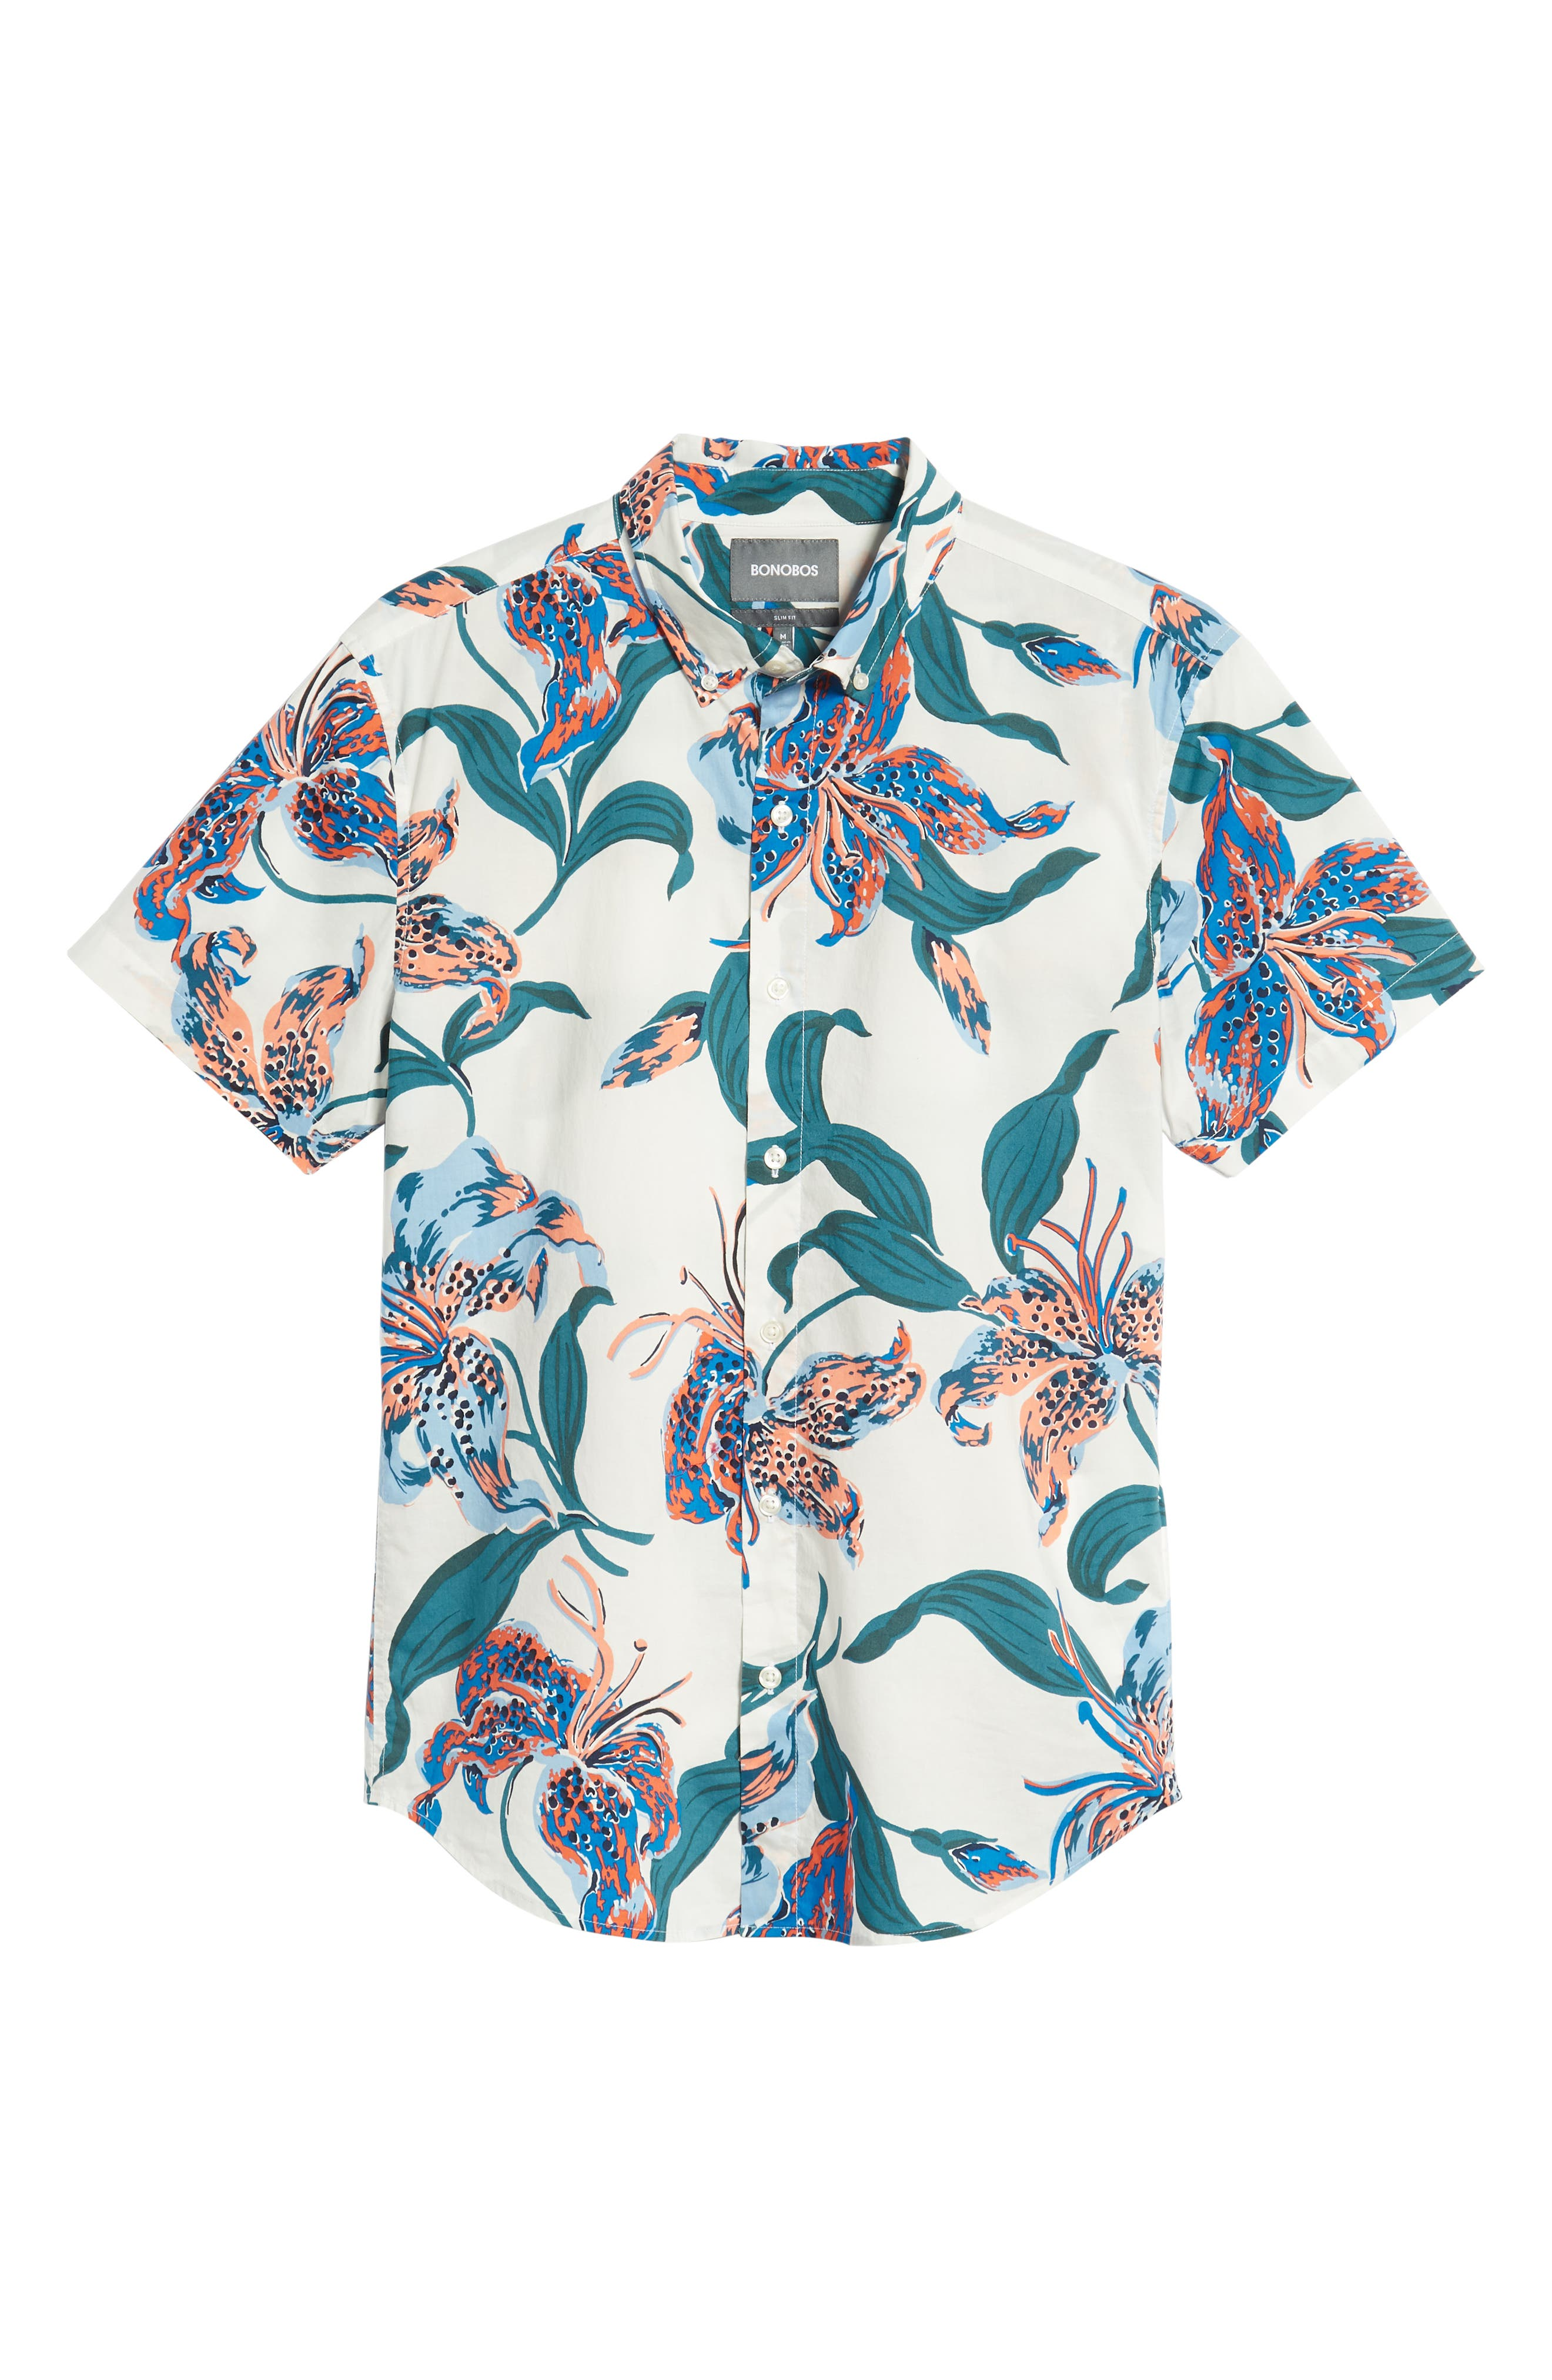 Riviera Slim Fit Floral Sport Shirt,                             Alternate thumbnail 5, color,                             BRIGHTON FLORAL - BLUE LEGACY